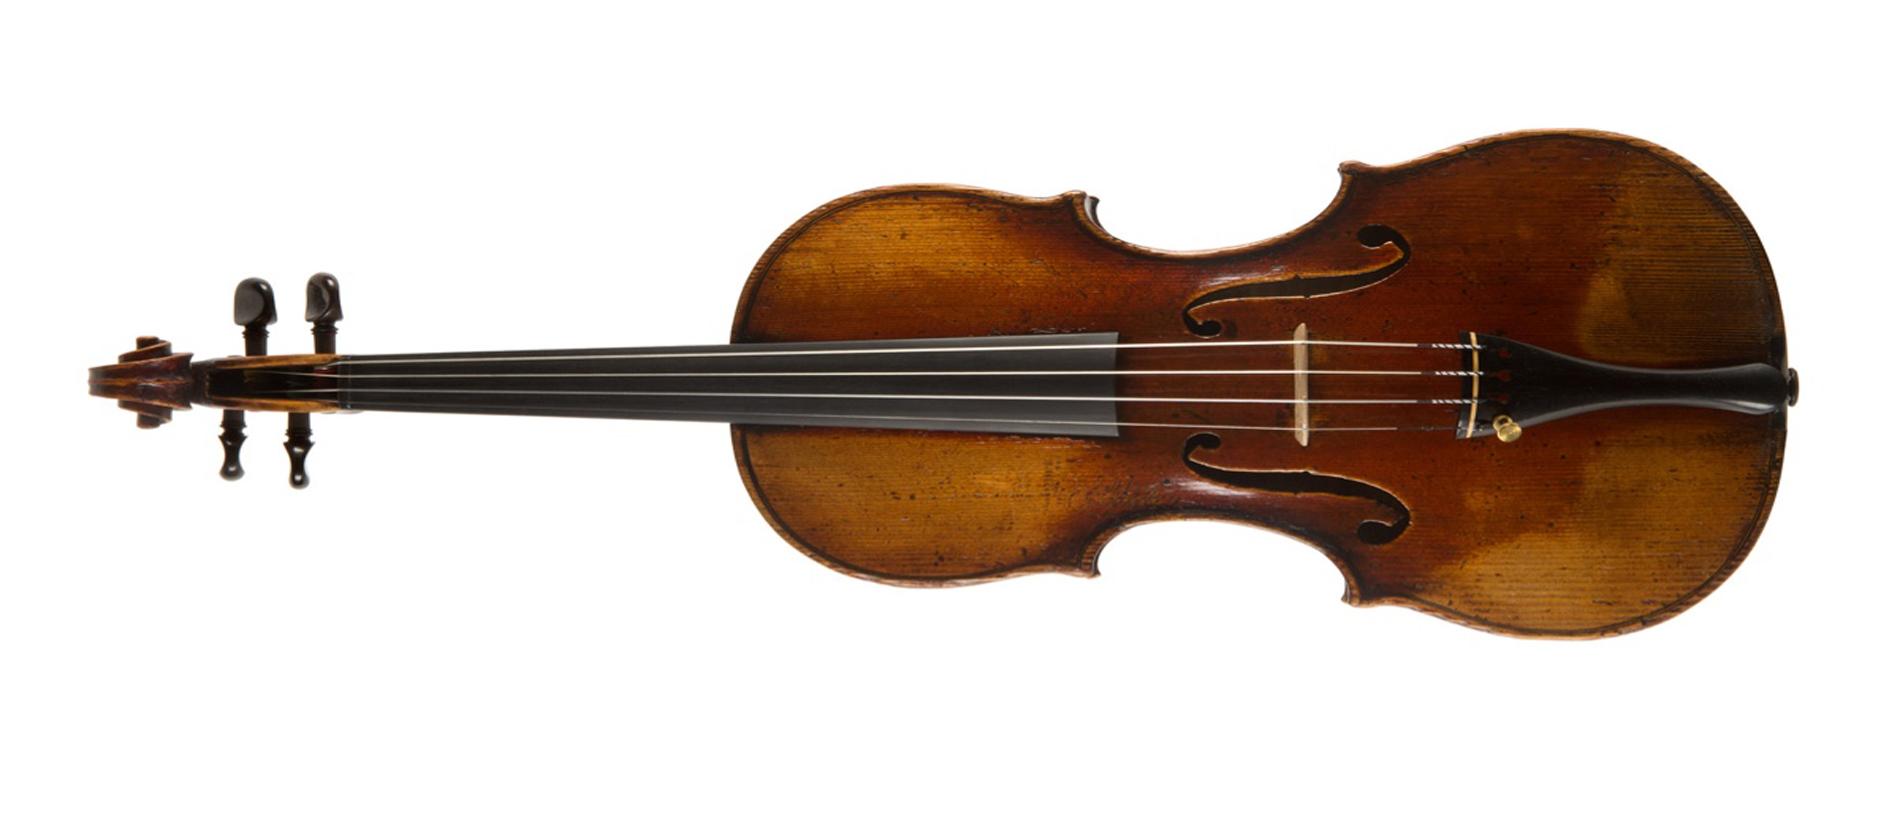 Violin Eckhart-Gramatte Joachim George 1 Chanot c 1830-1850